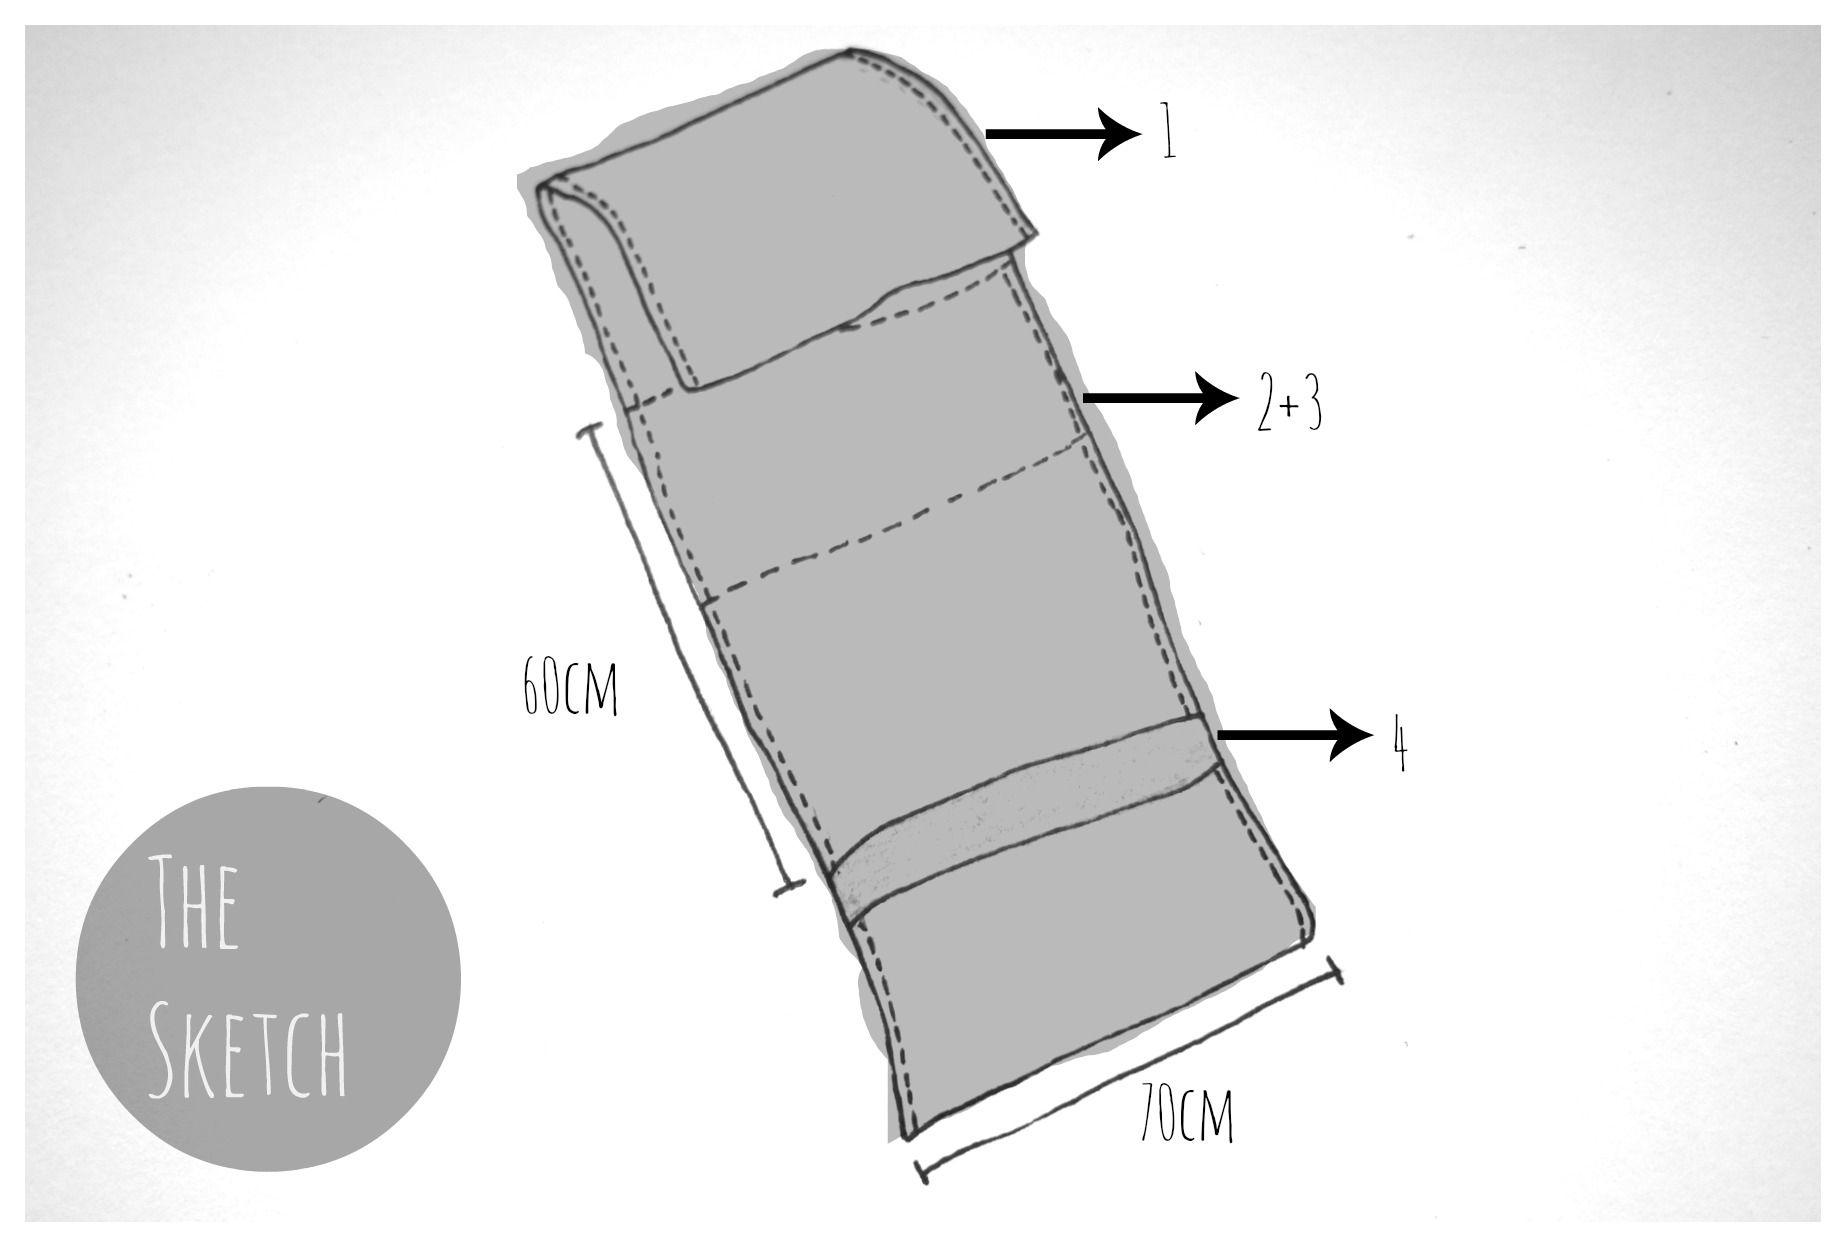 Ikea Poang Chair Covers Uk Spotlight Australia Make Diy Pello Felt Cover Create Cover2